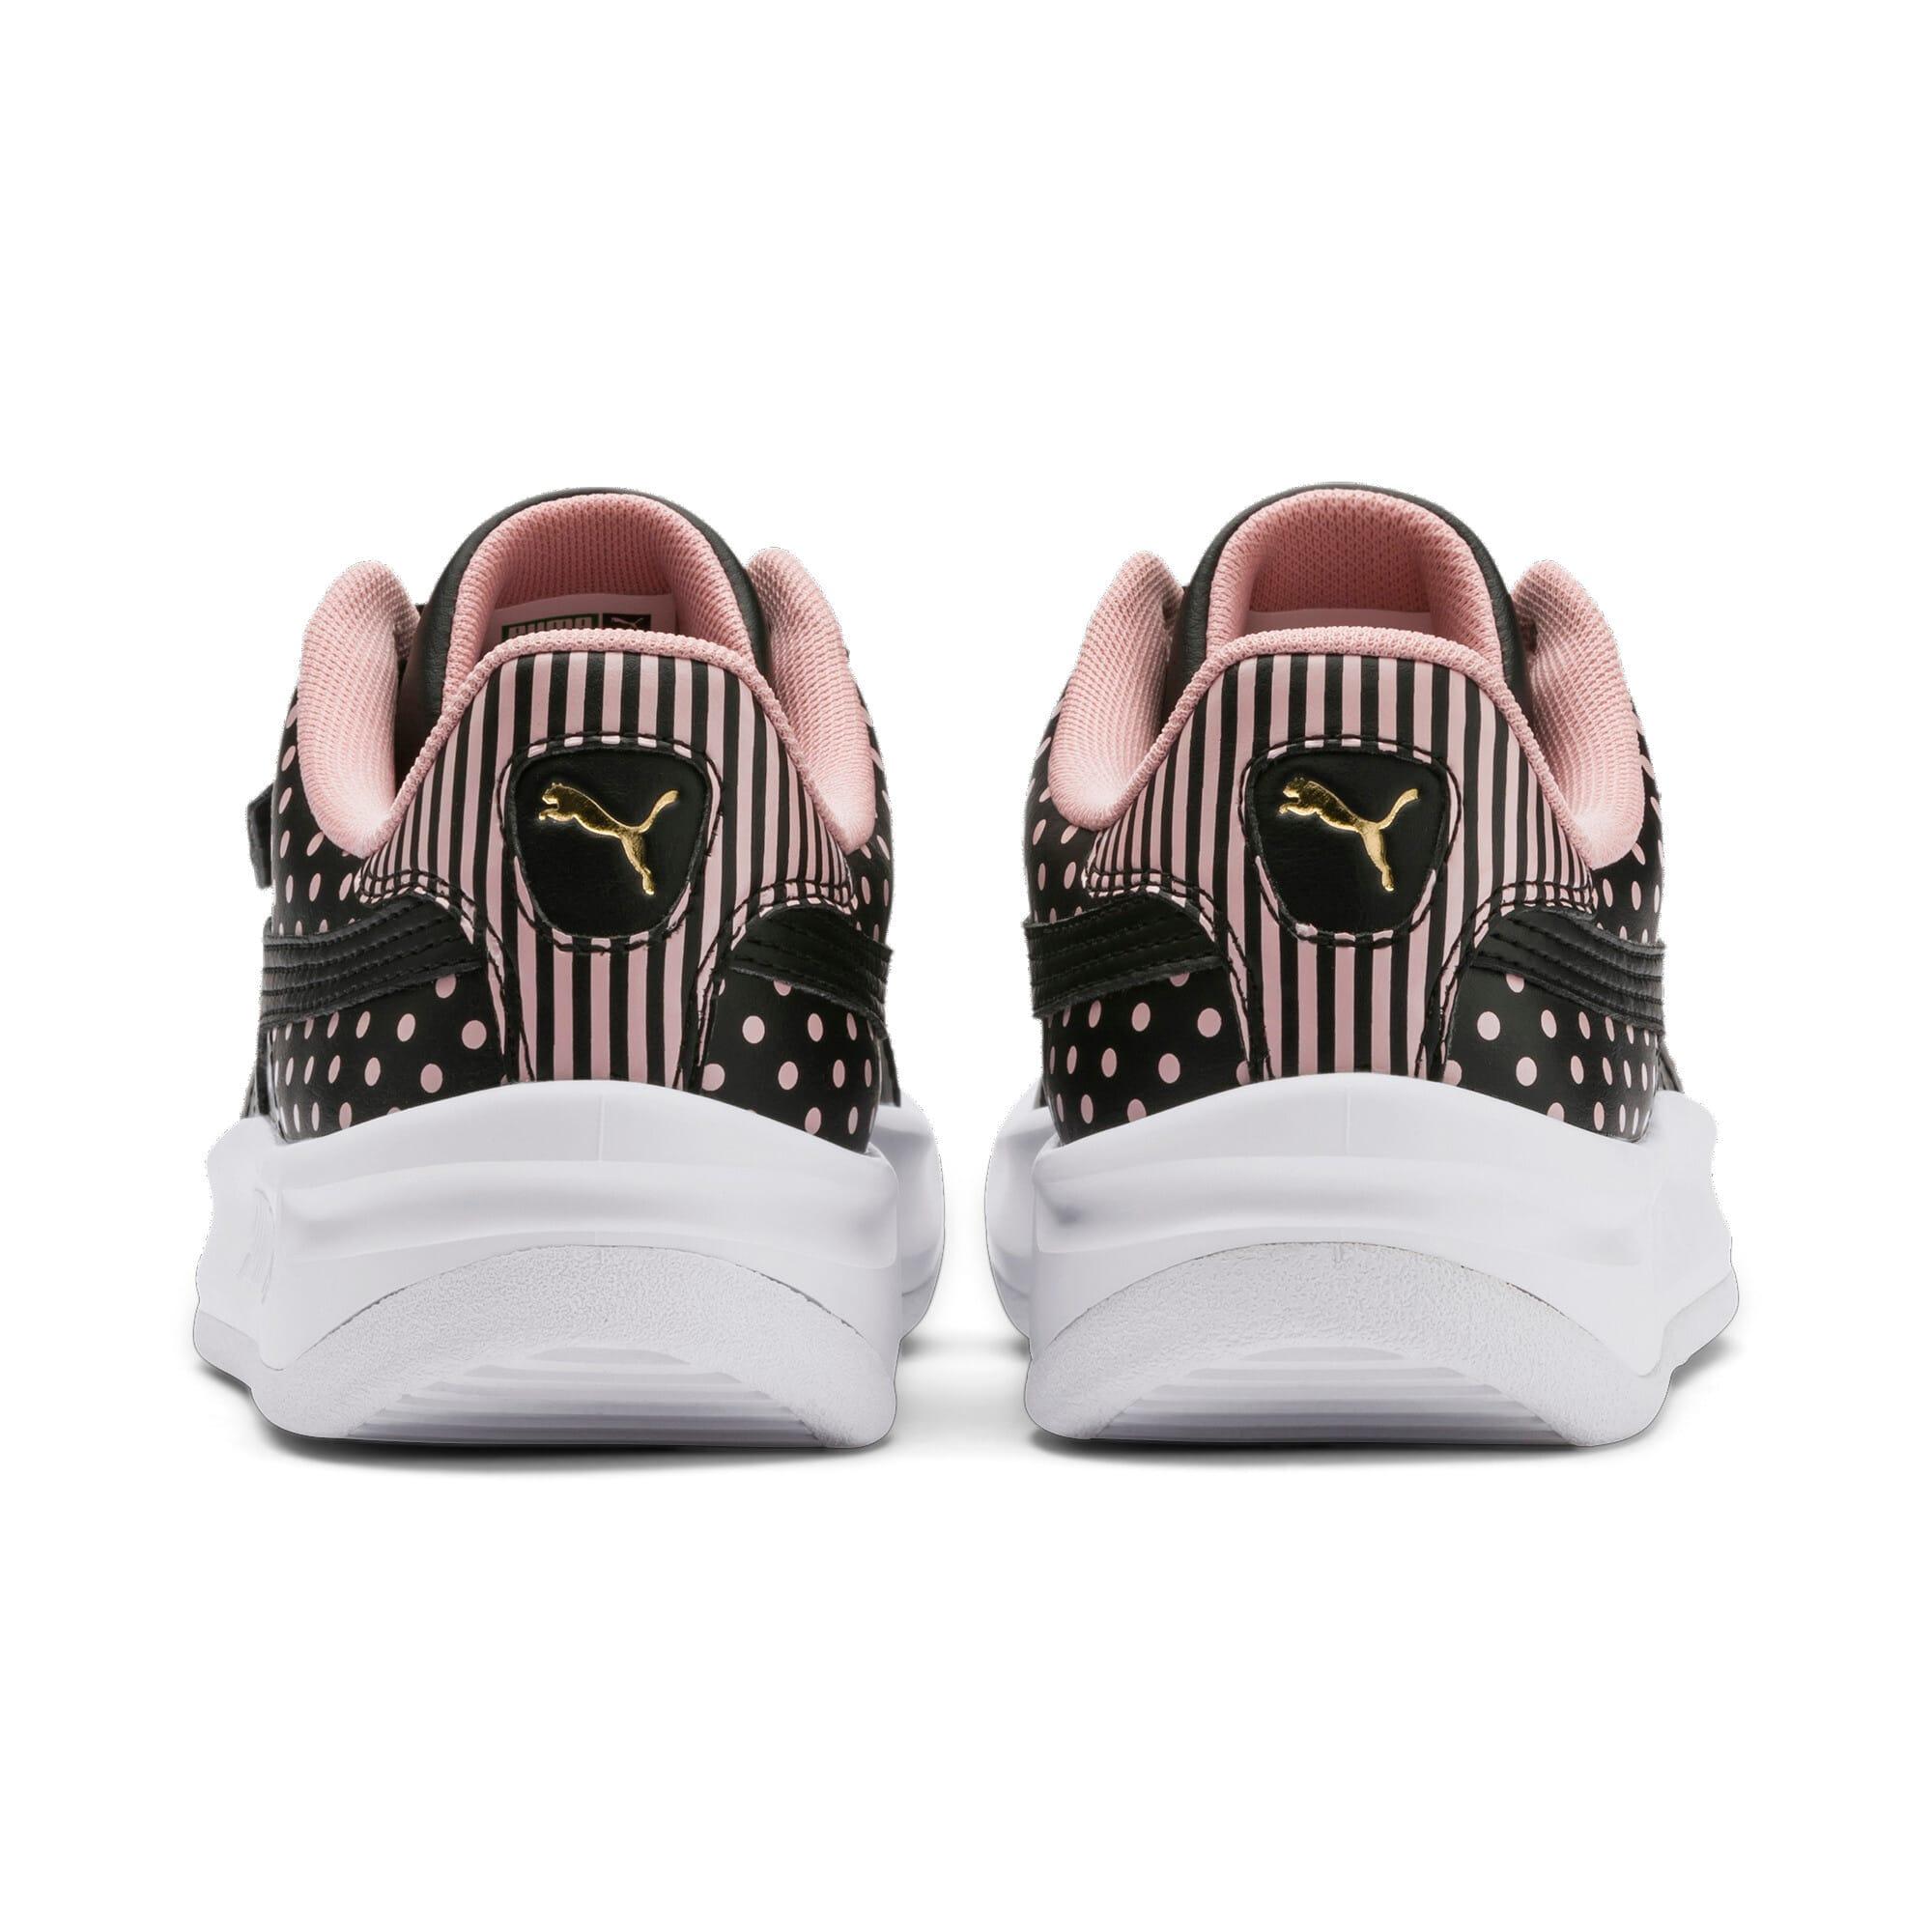 Thumbnail 4 of California Remix Women's Sneakers, Puma Black-Bridal Rose, medium